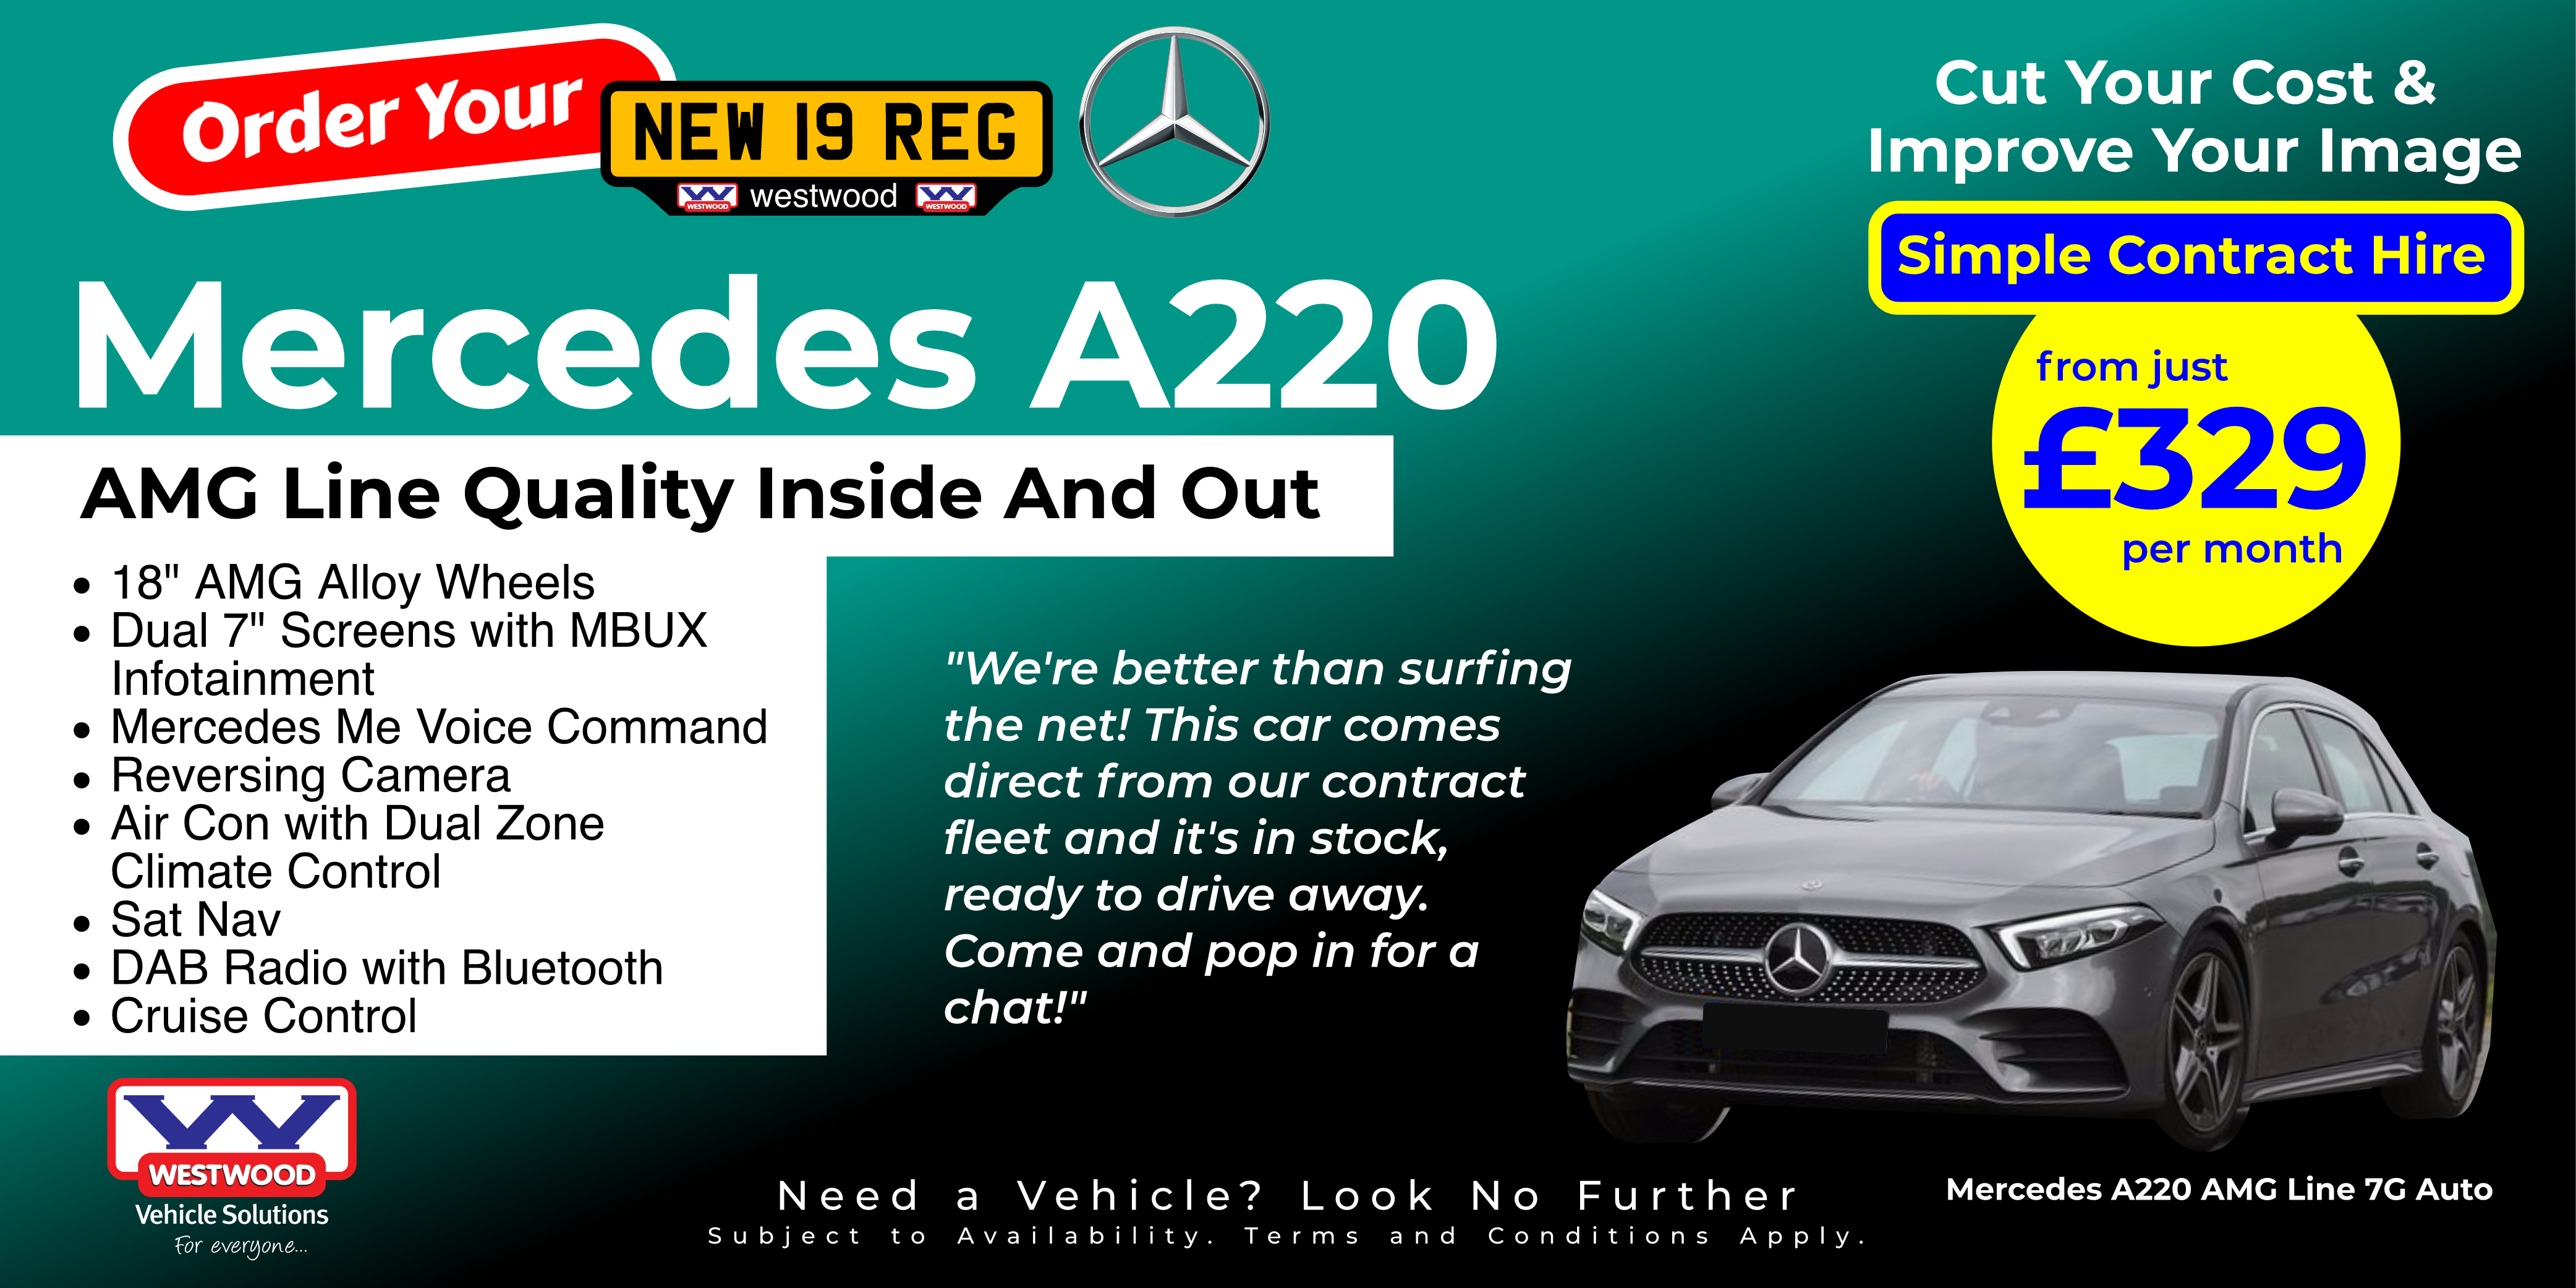 Mercedes A220 AMG Line 3